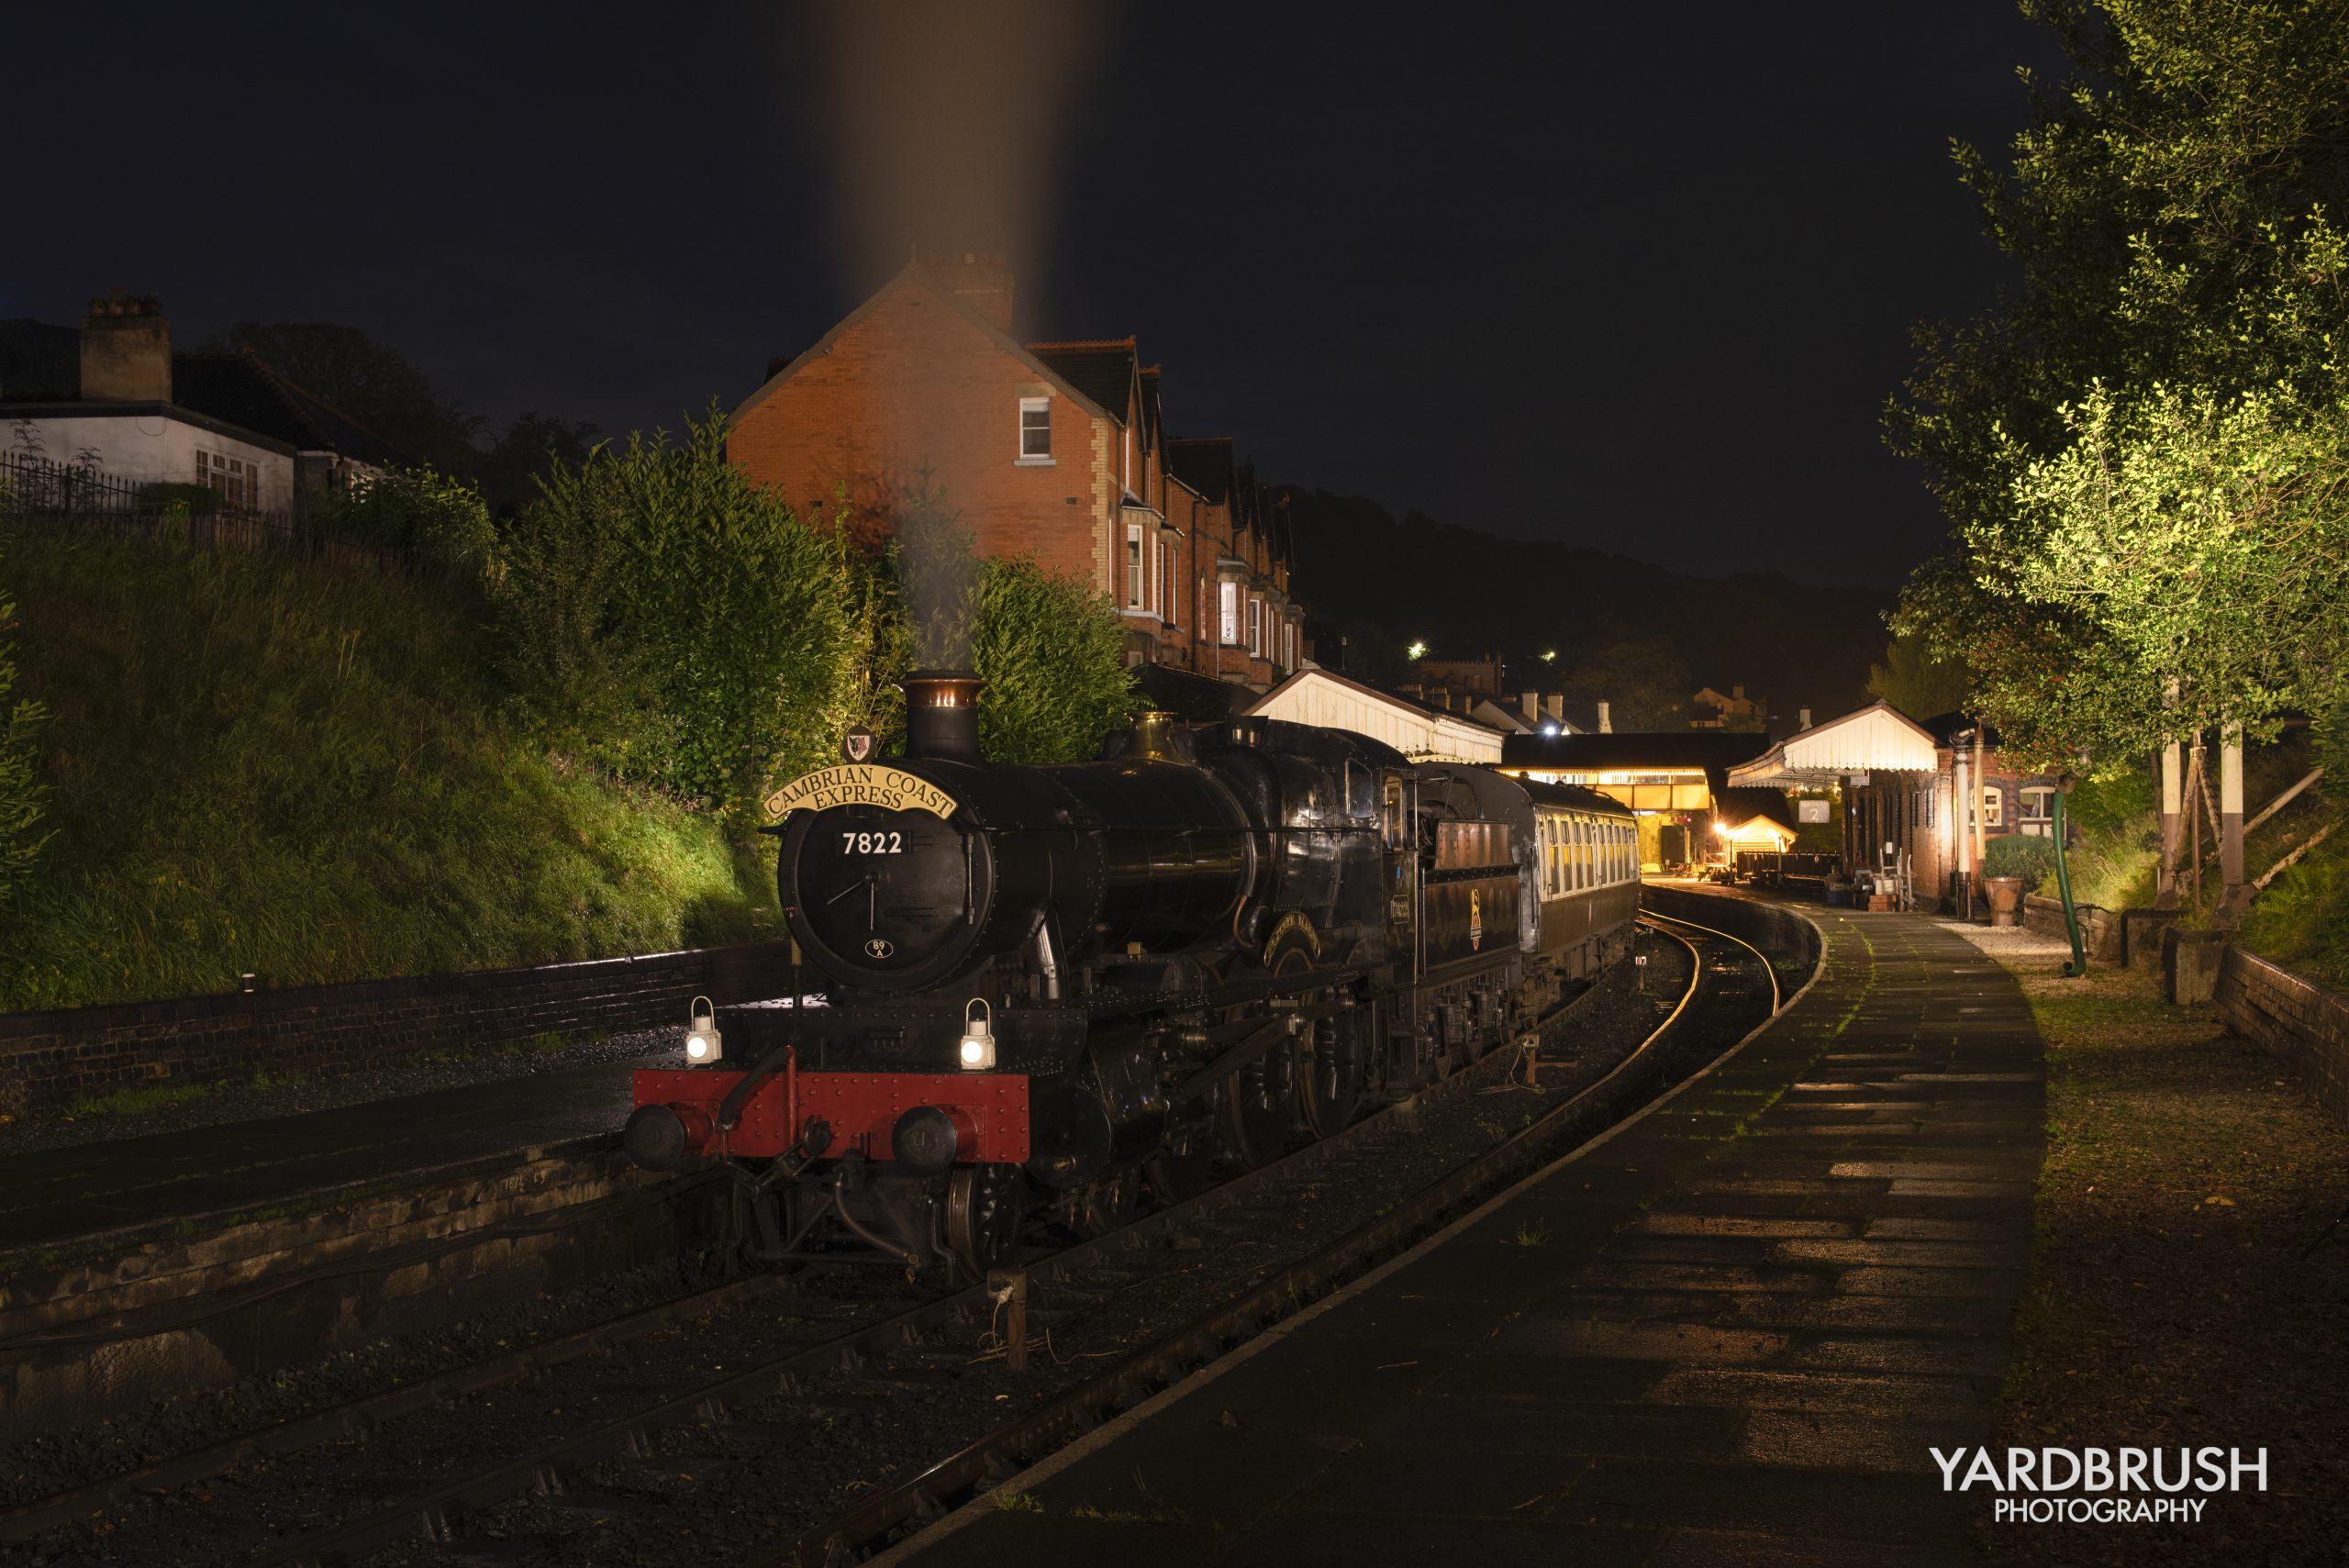 7822 Foxcote Manor at the Llangollen Railway